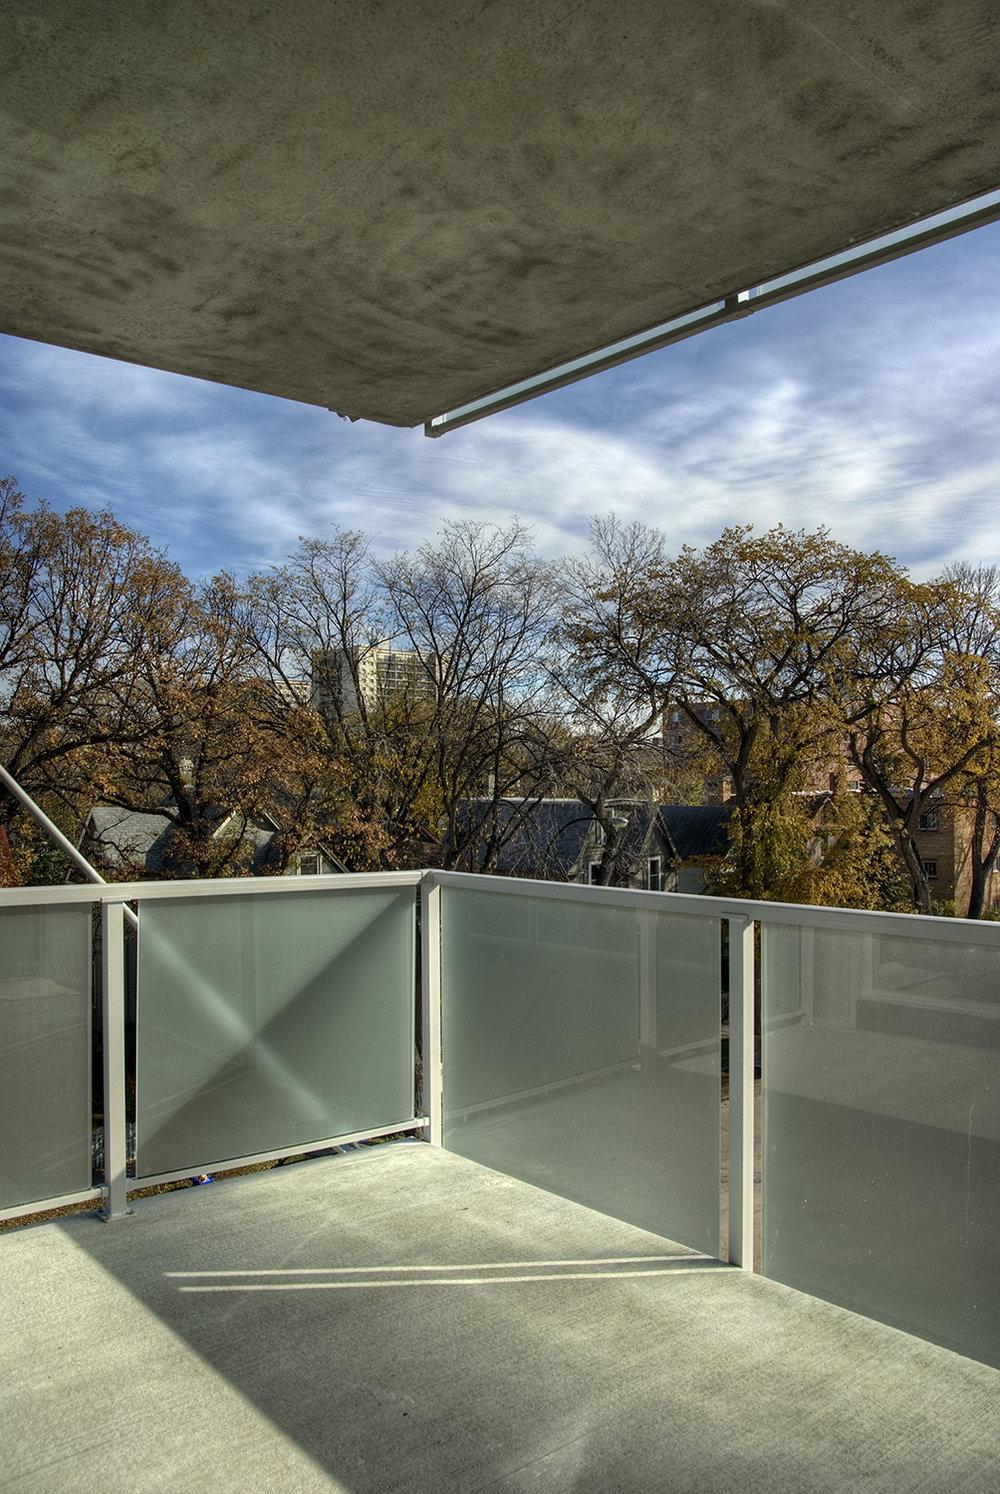 Pulse on River Condominiums, interior photo of balcony / Photo: Bryan Scott